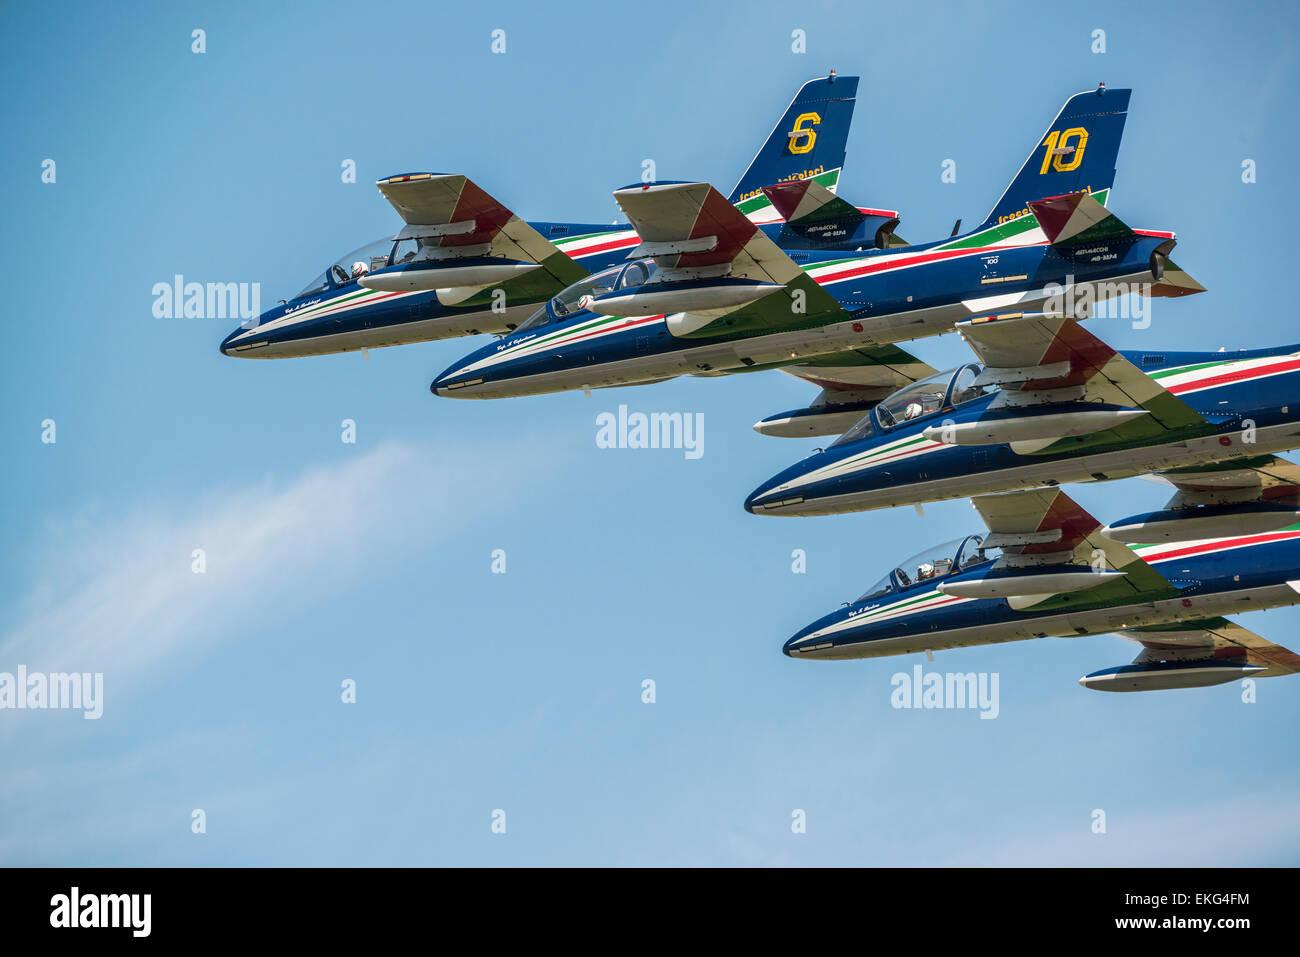 Italian Air Force Frecce Tricolori Display Team RIAT 2014 - Aermacchi AT-339A aircraft Stock Photo